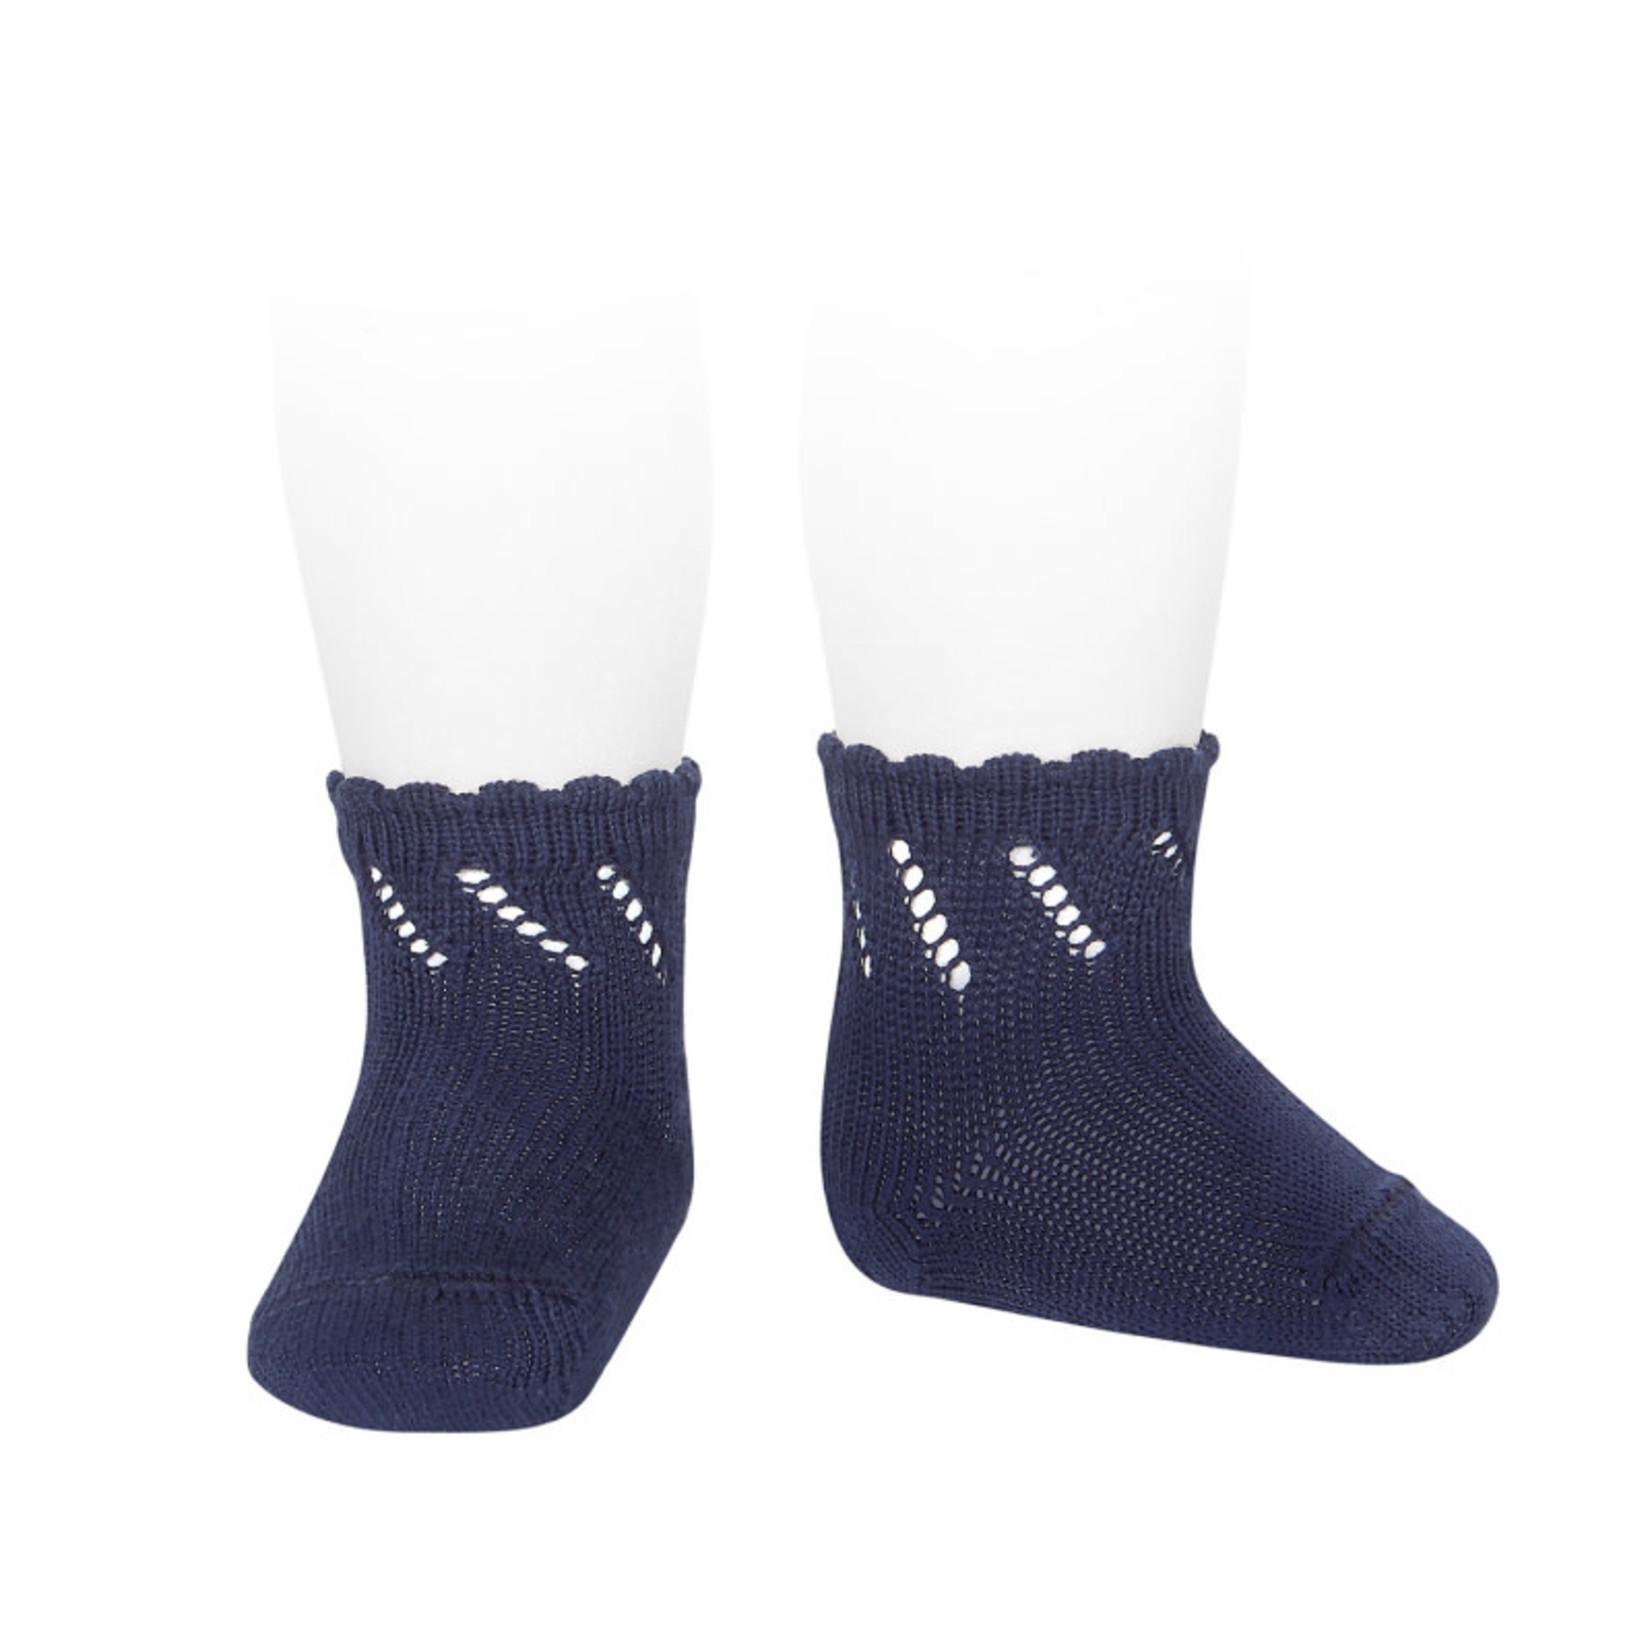 Newborn Socks - Navy